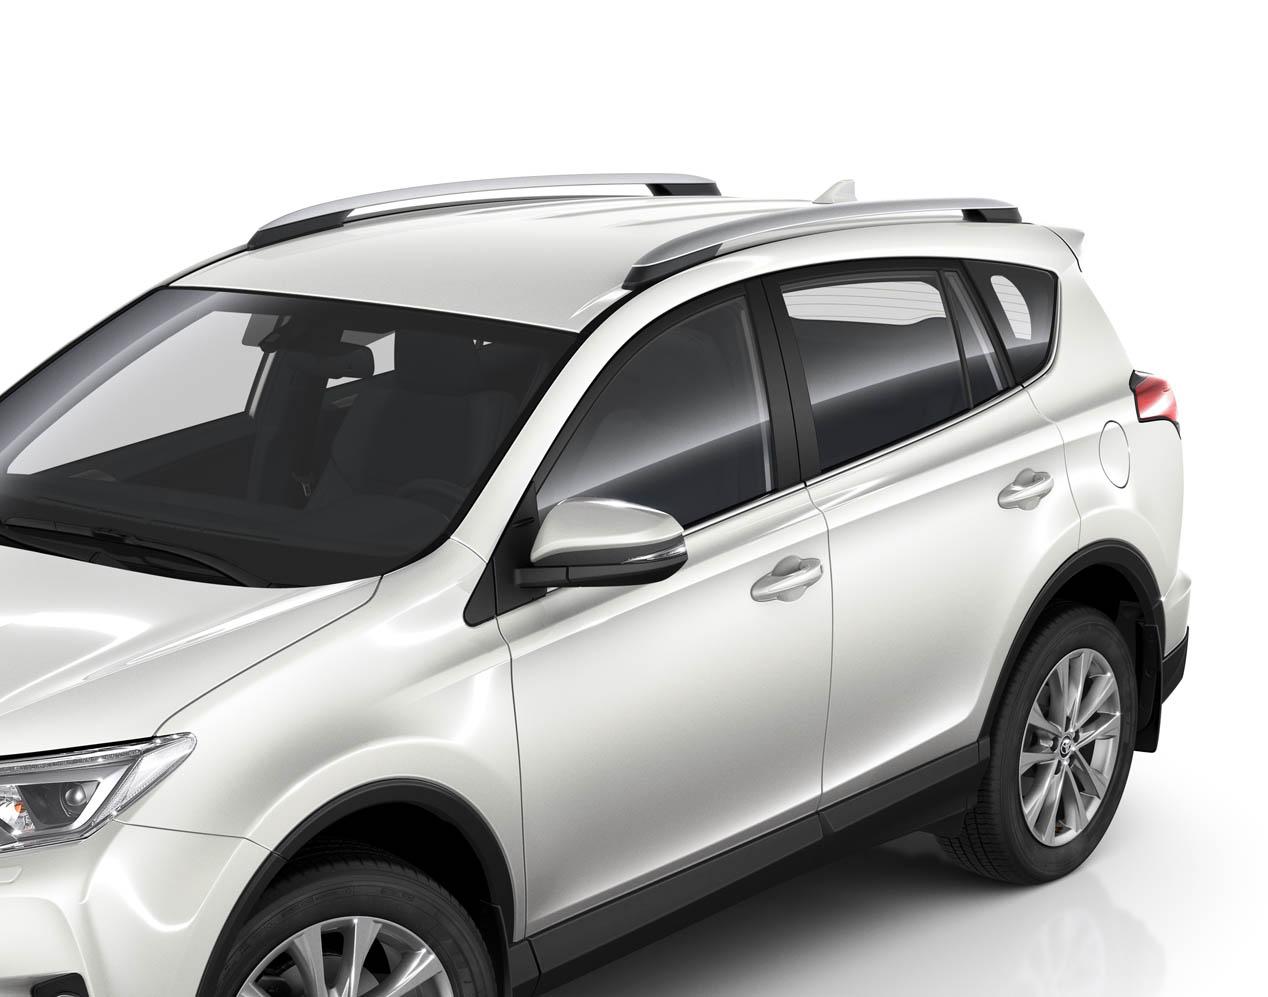 Accesorios Toyota RAV4 2016